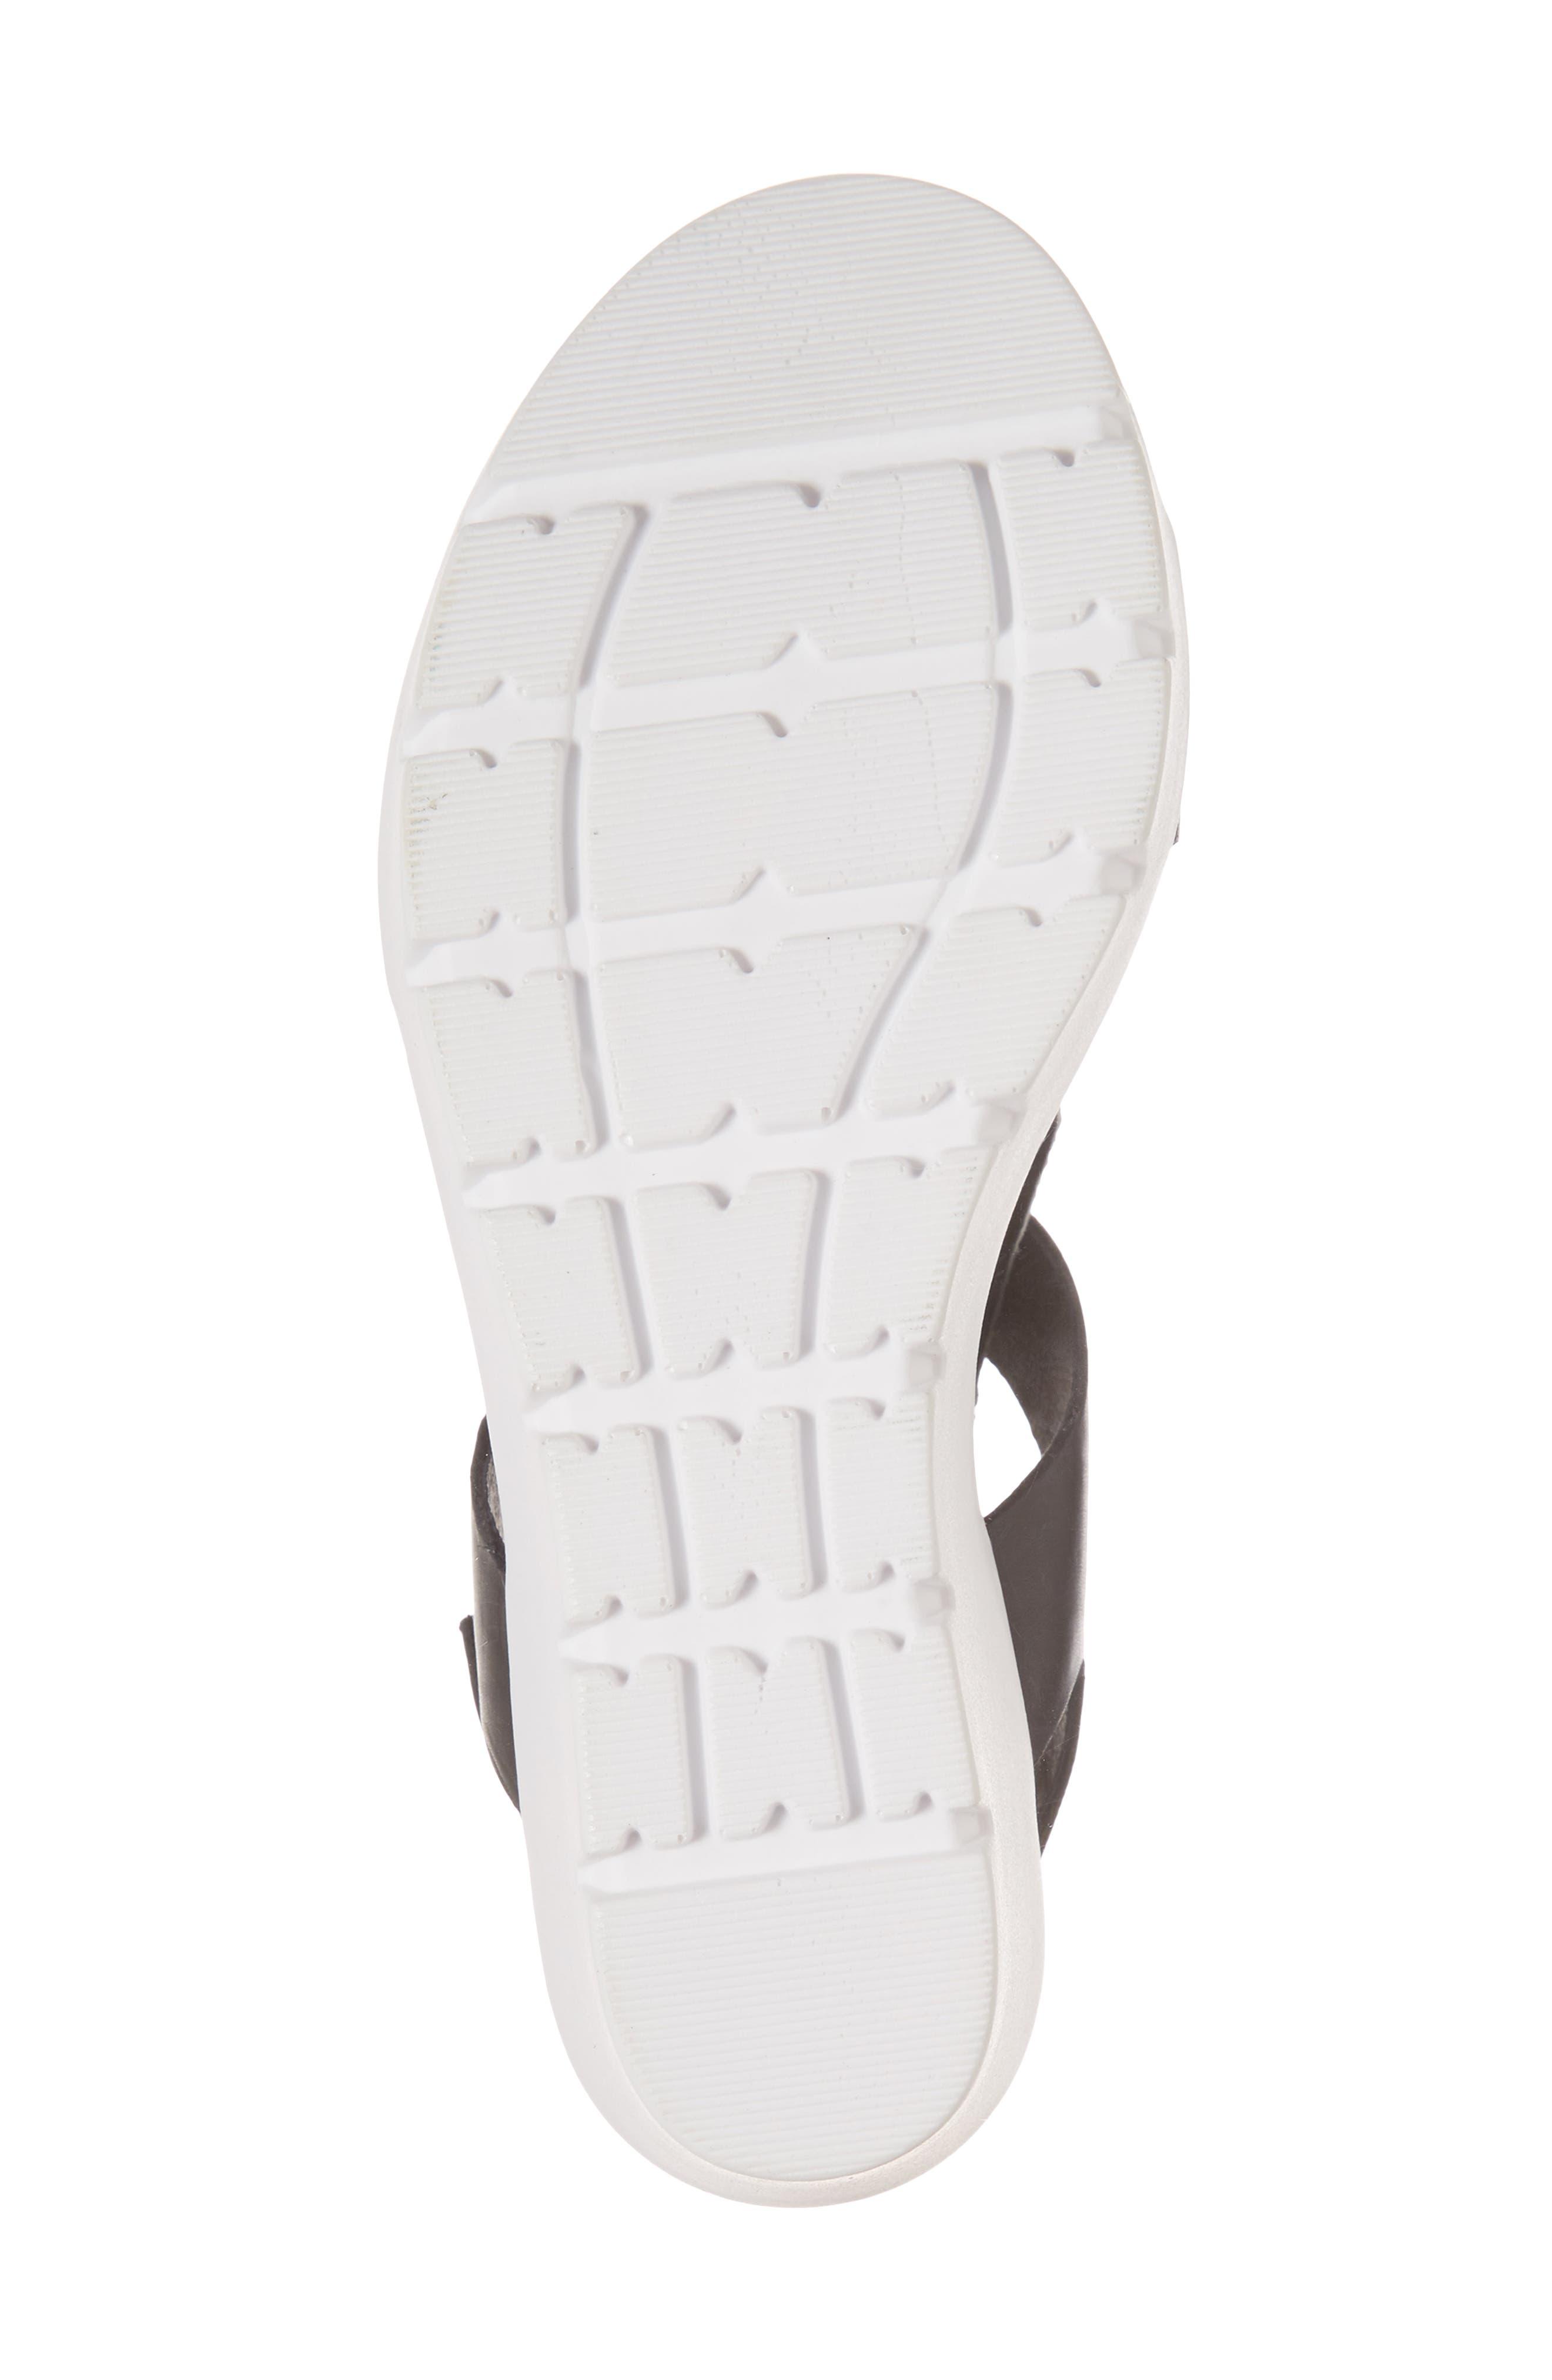 Somo Platform Wedge Sandal,                             Alternate thumbnail 6, color,                             BLACK/ WHITE SMOOTH LEATHER